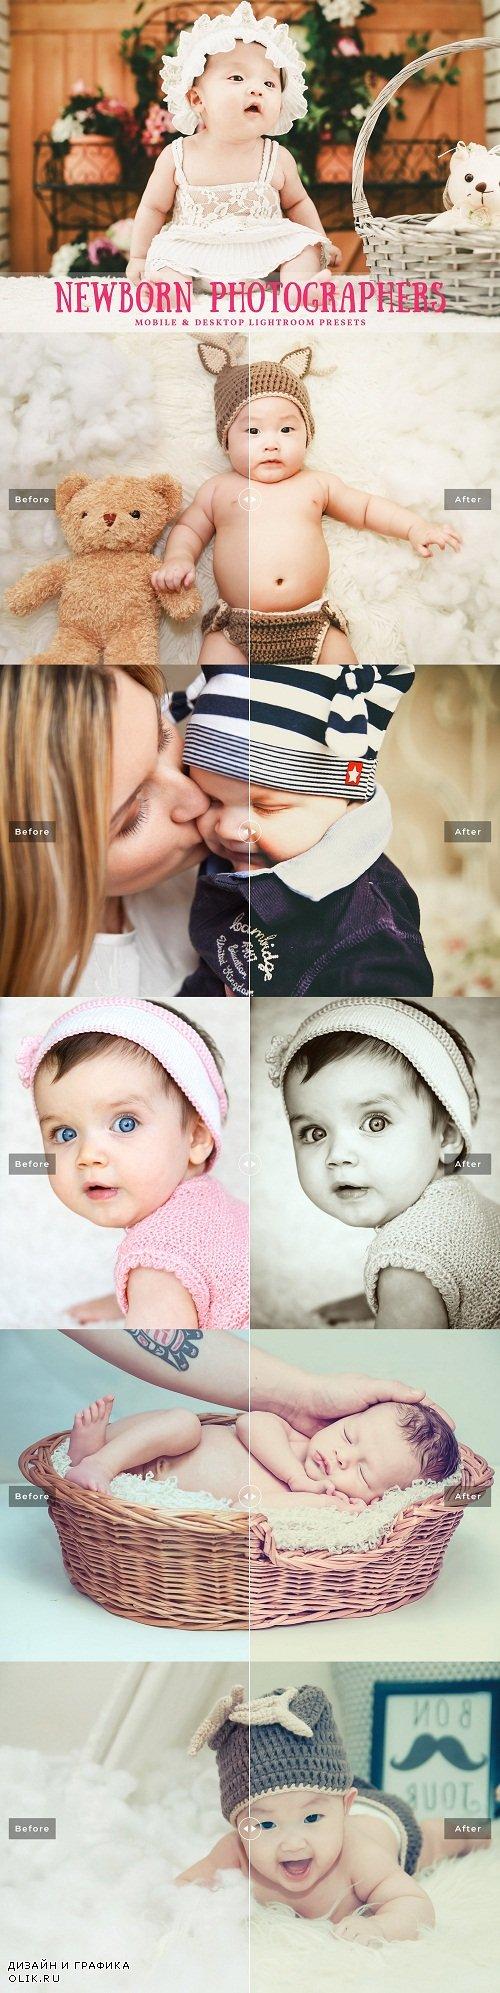 Newborn LRM Presets Pack - 3703958